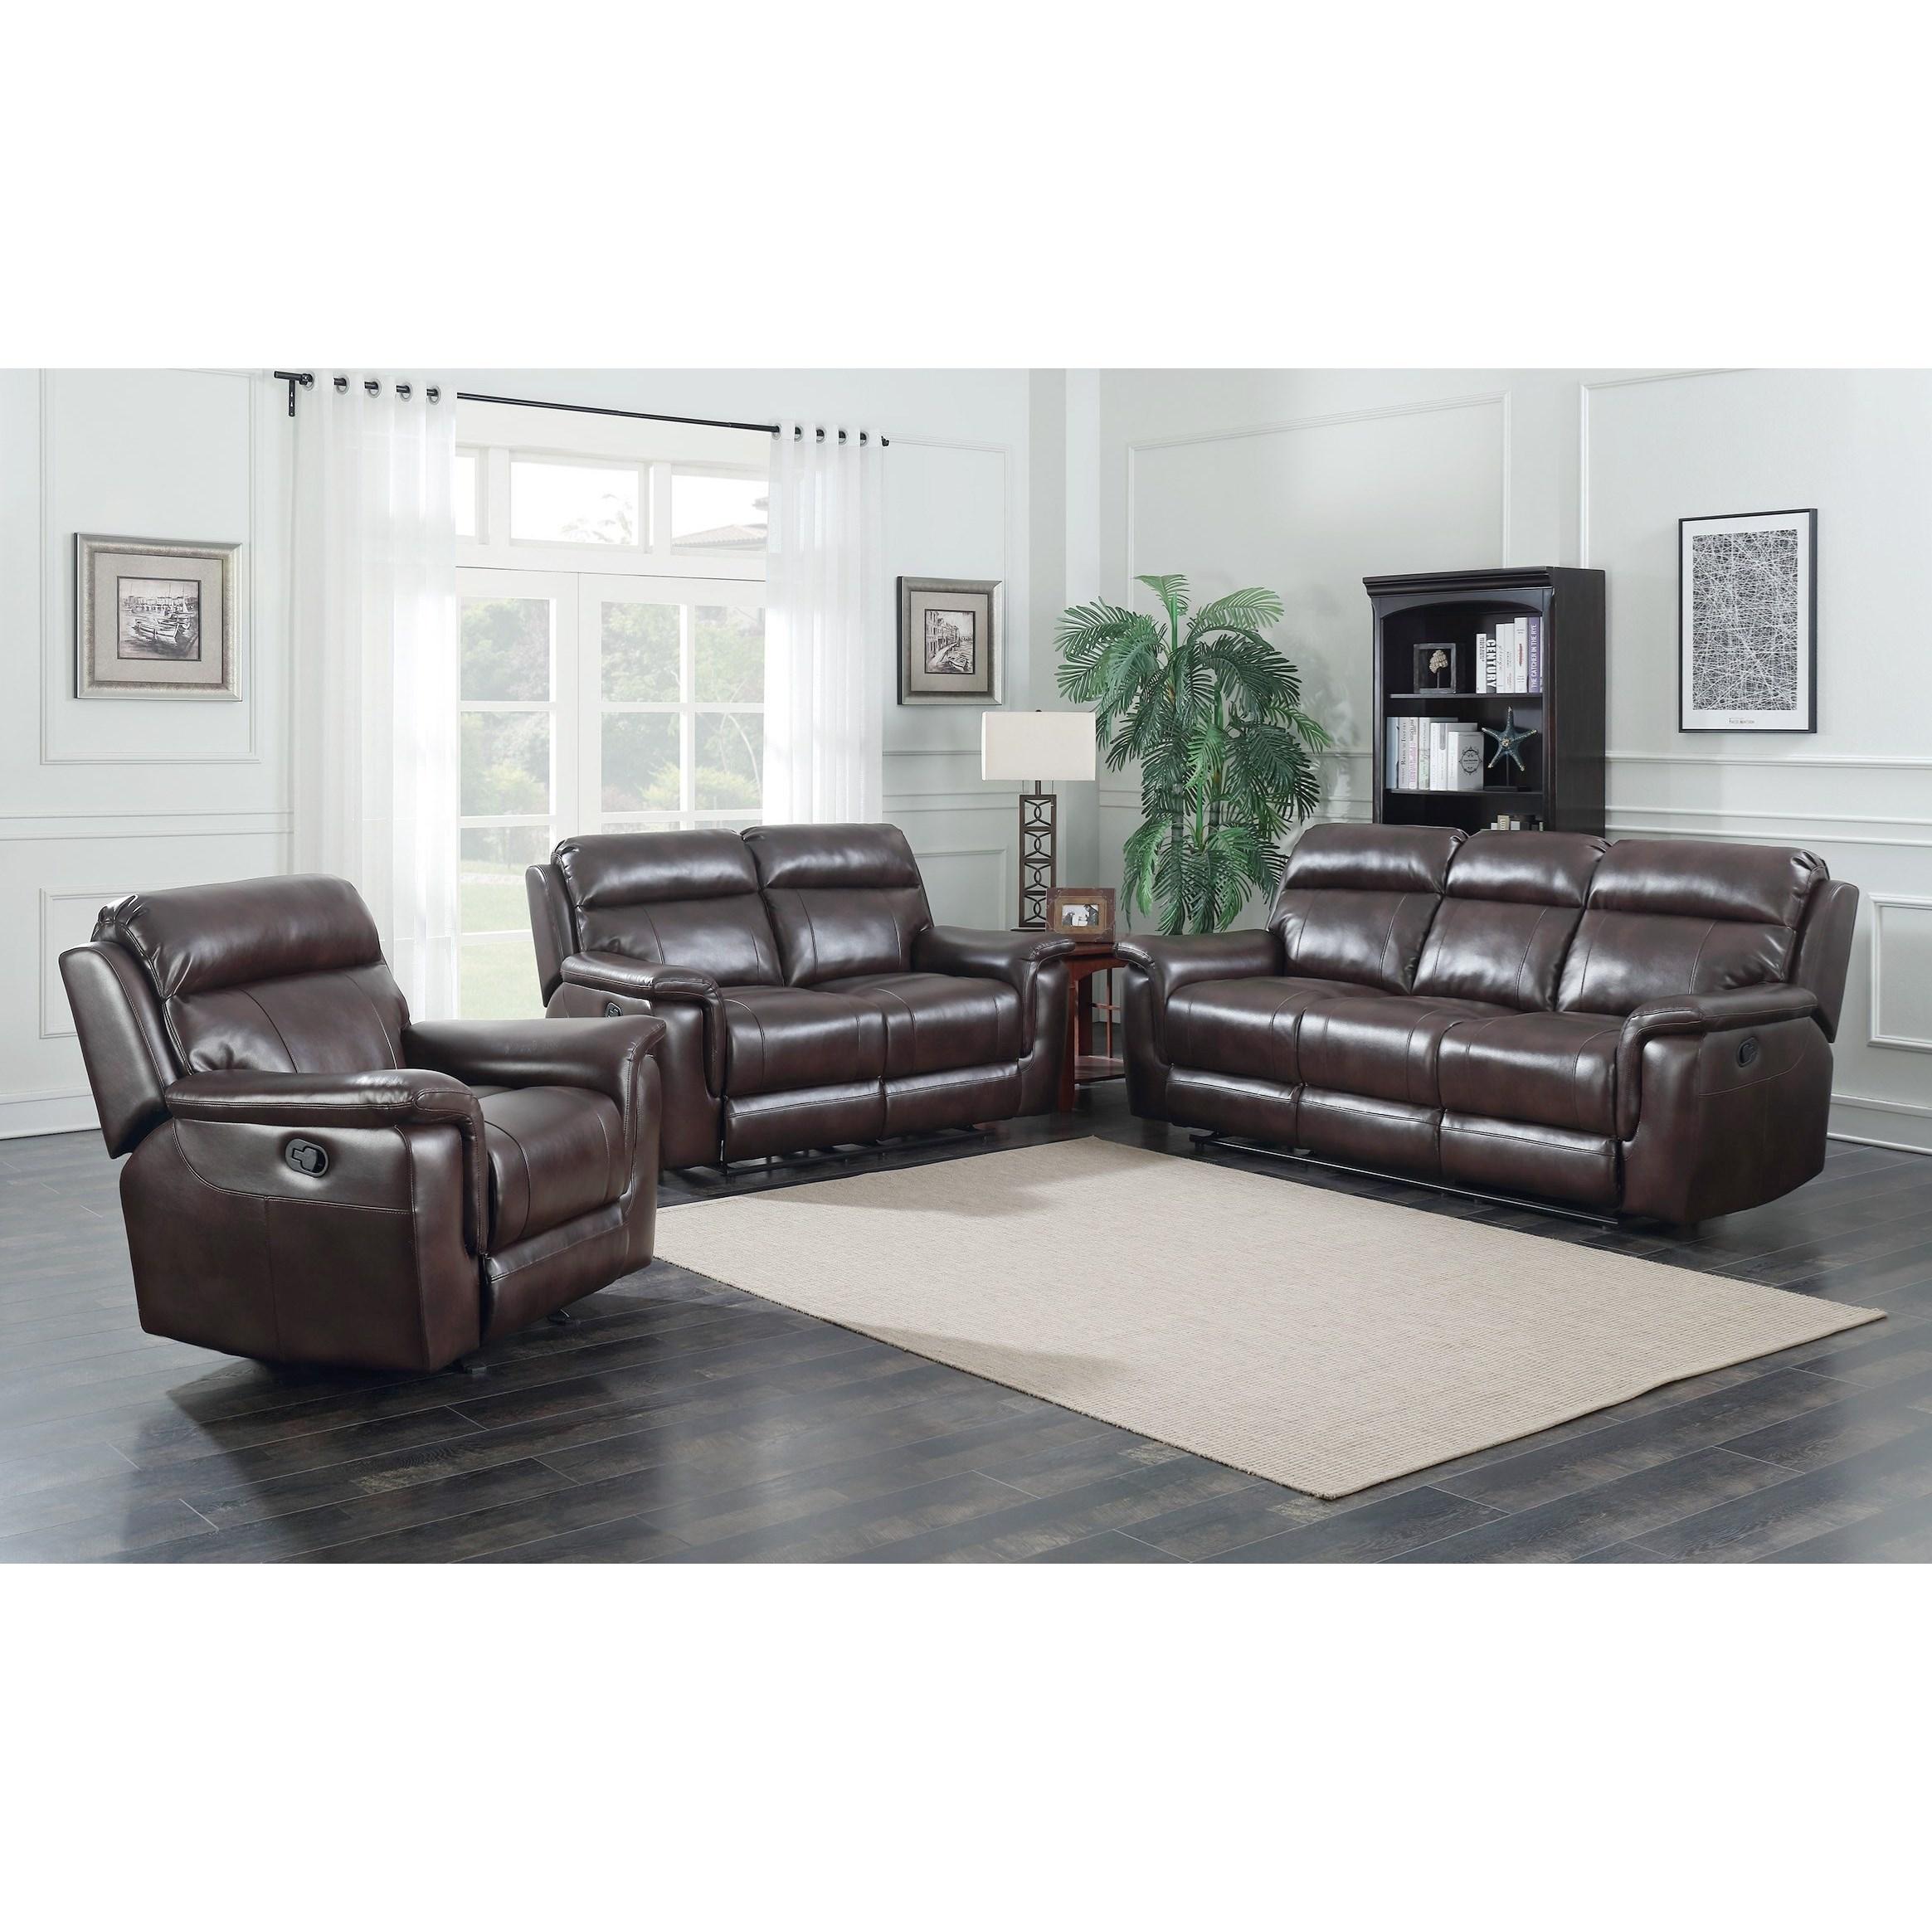 Living Room Essentials: Belfort Essentials Dakota Reclining Living Room Group